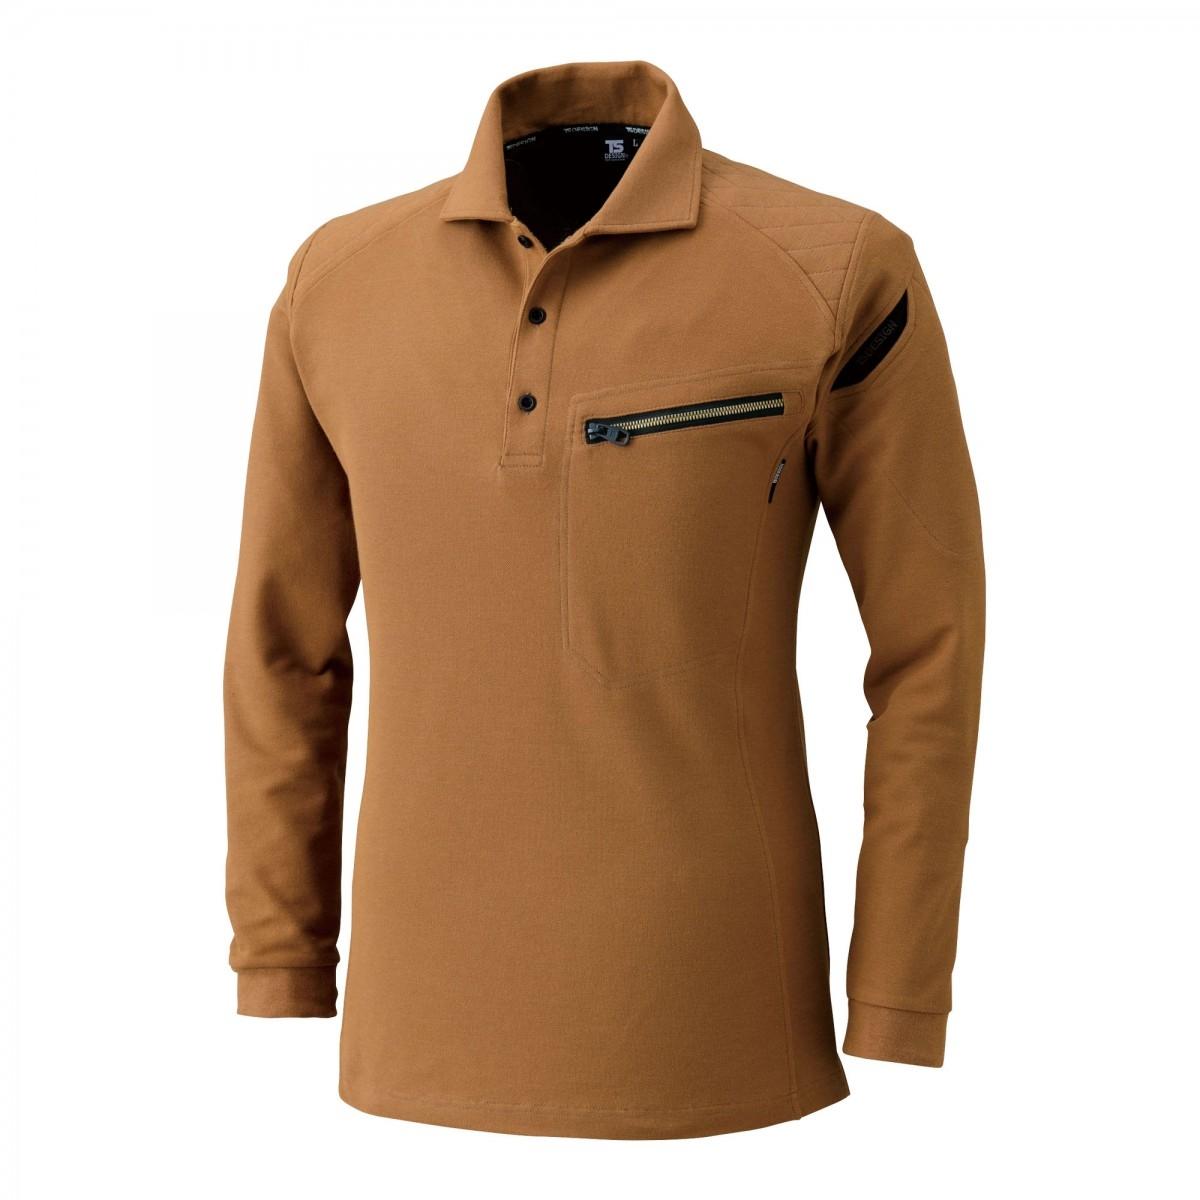 TS DESIGN~TSデザイン~5105 ワークニットロングポロシャツ 65 キャメル